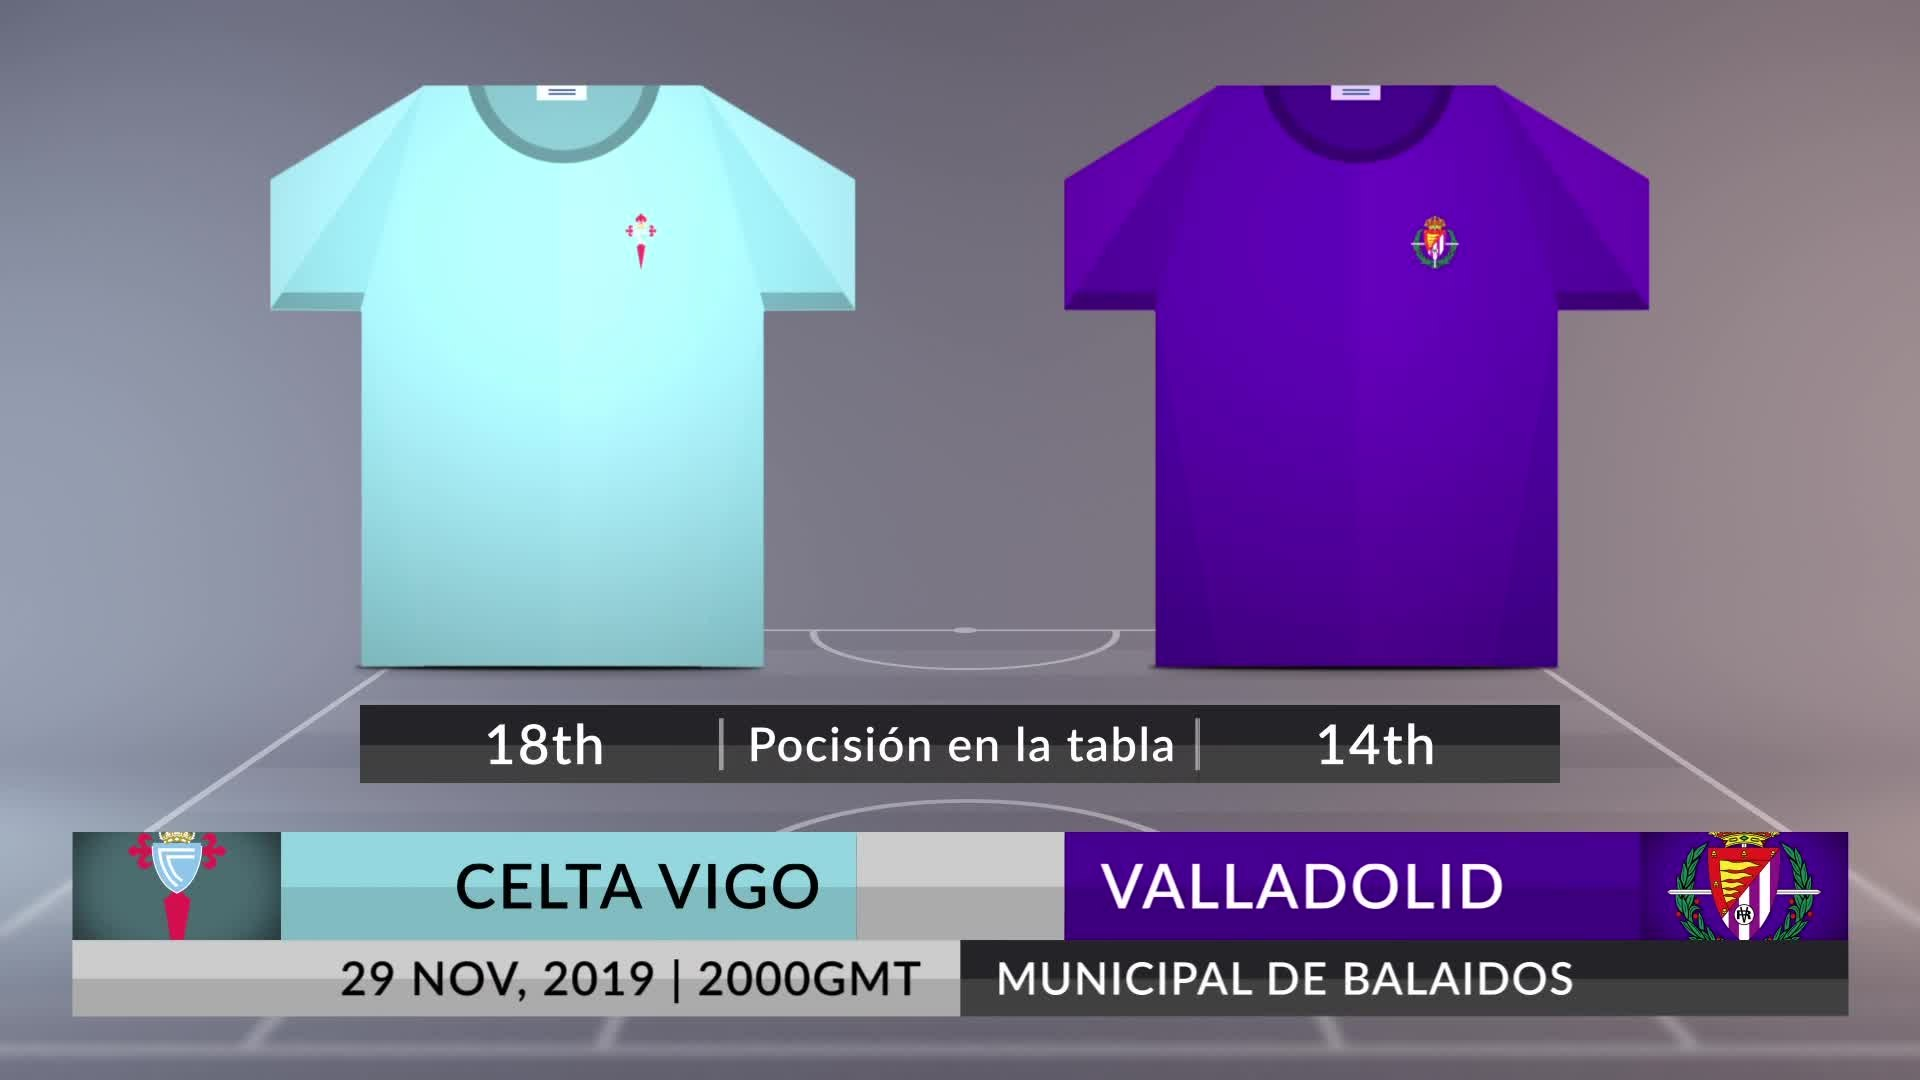 Match Preview: Celta Vigo vs Valladolid on 29/11/2019